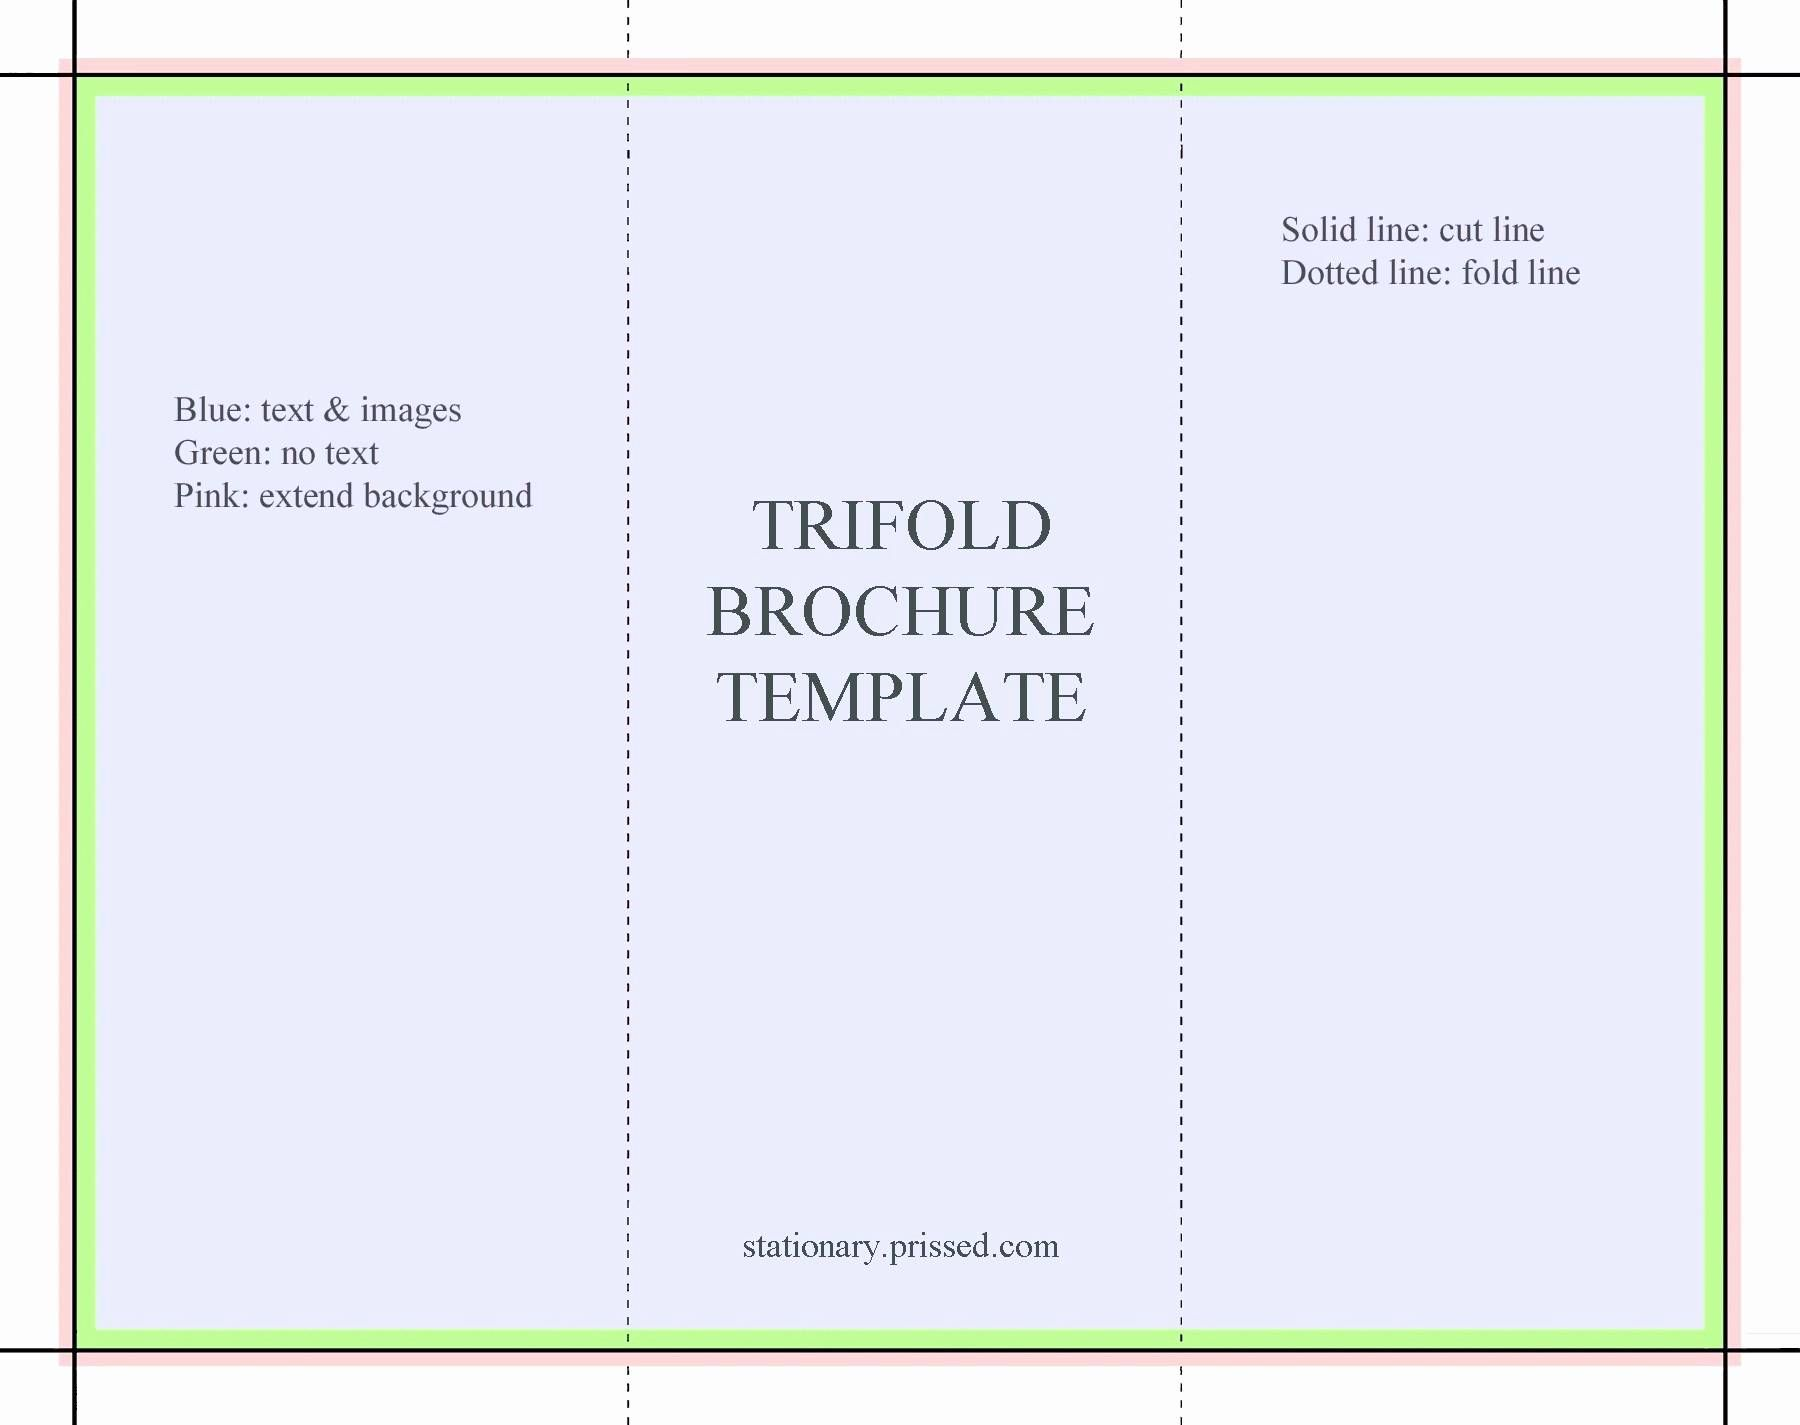 google docs brochure template - Dicim Within Travel Brochure Template Google Docs